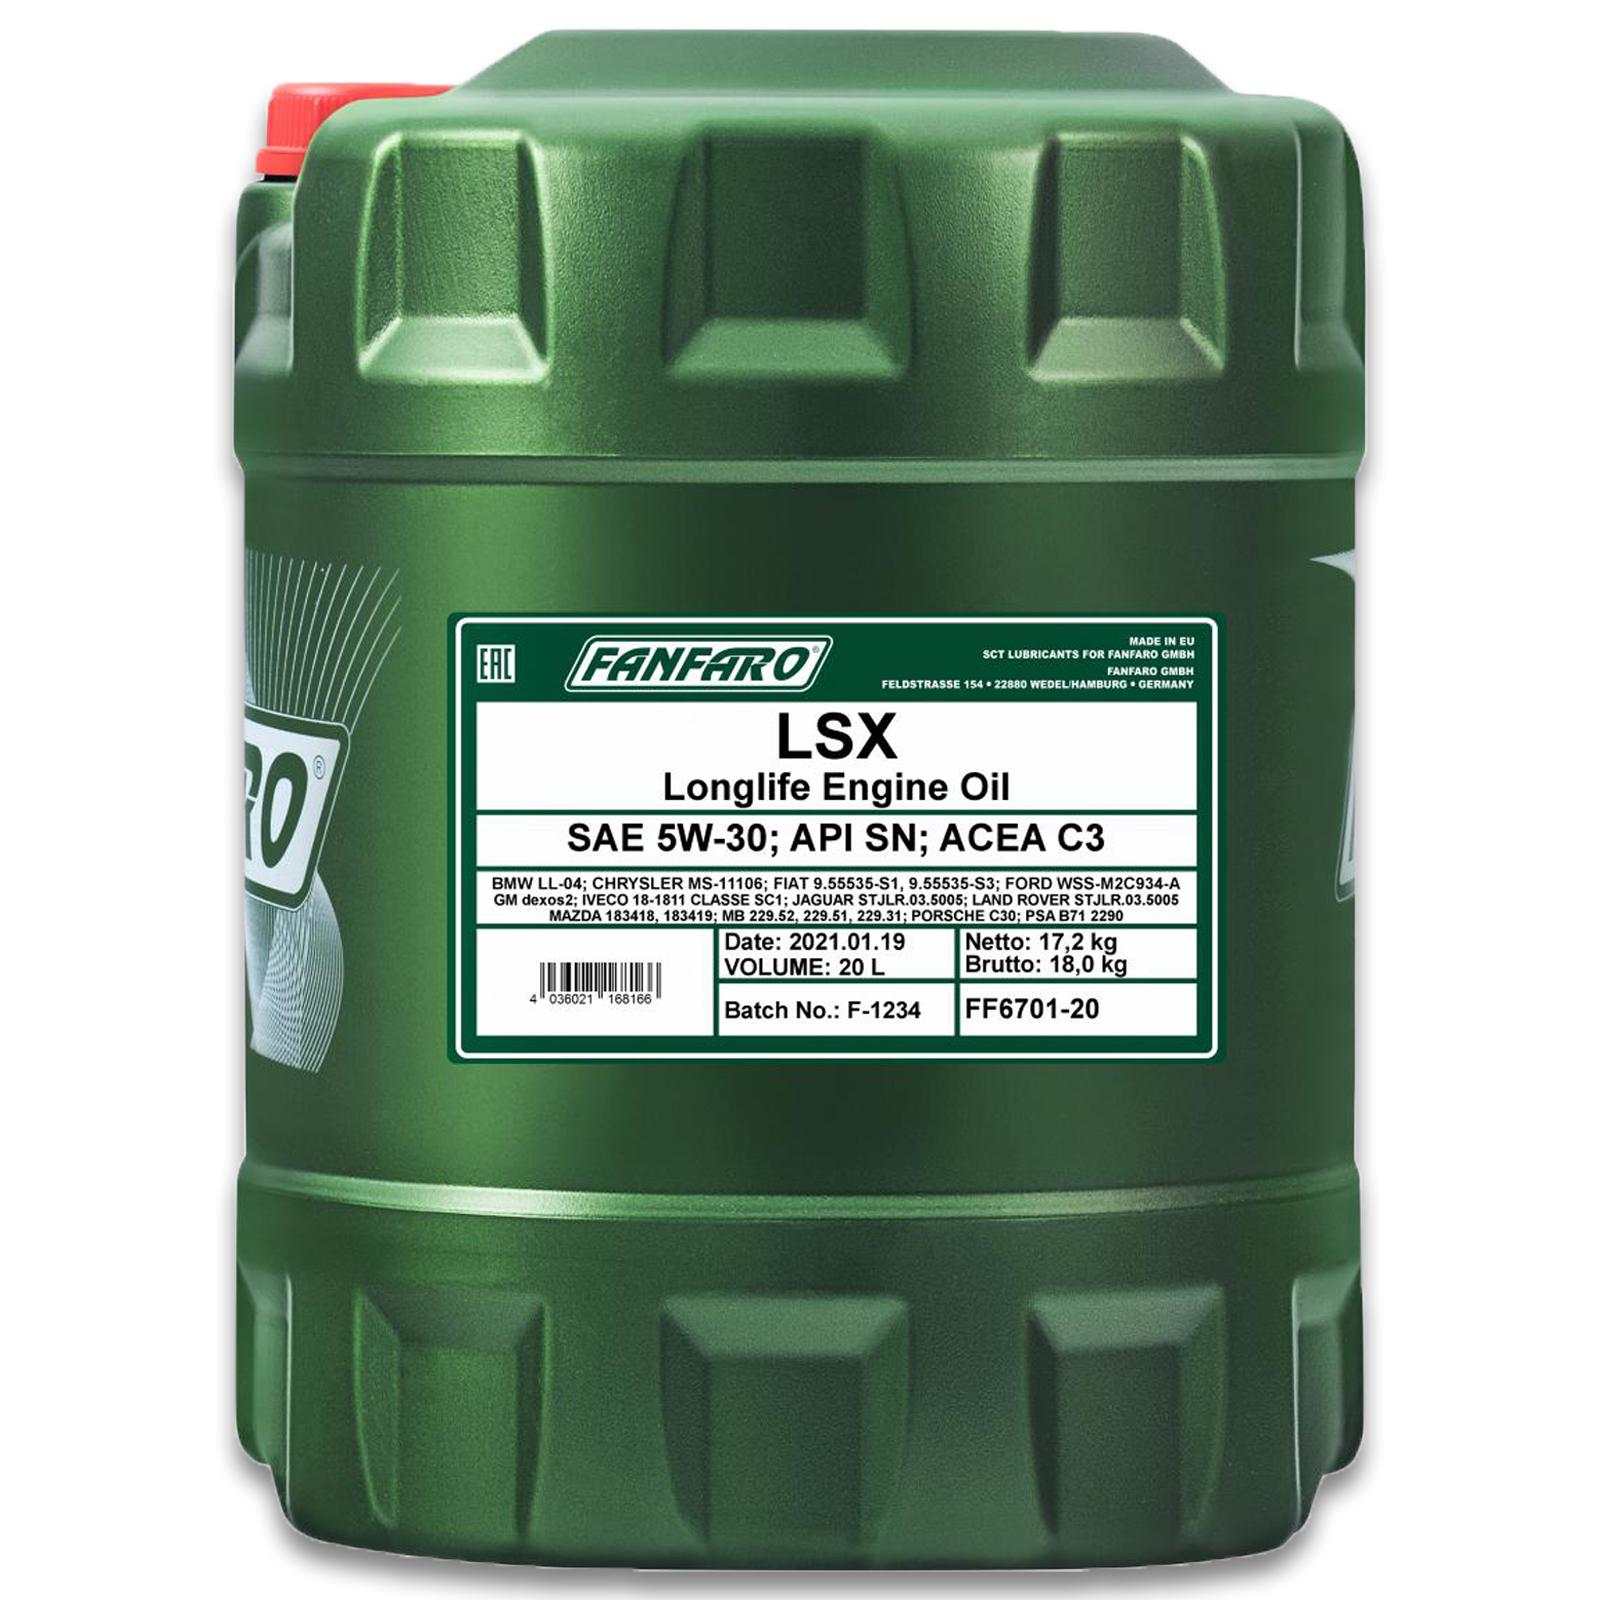 20L Fanfaro 5W-30 LXS Motoröl